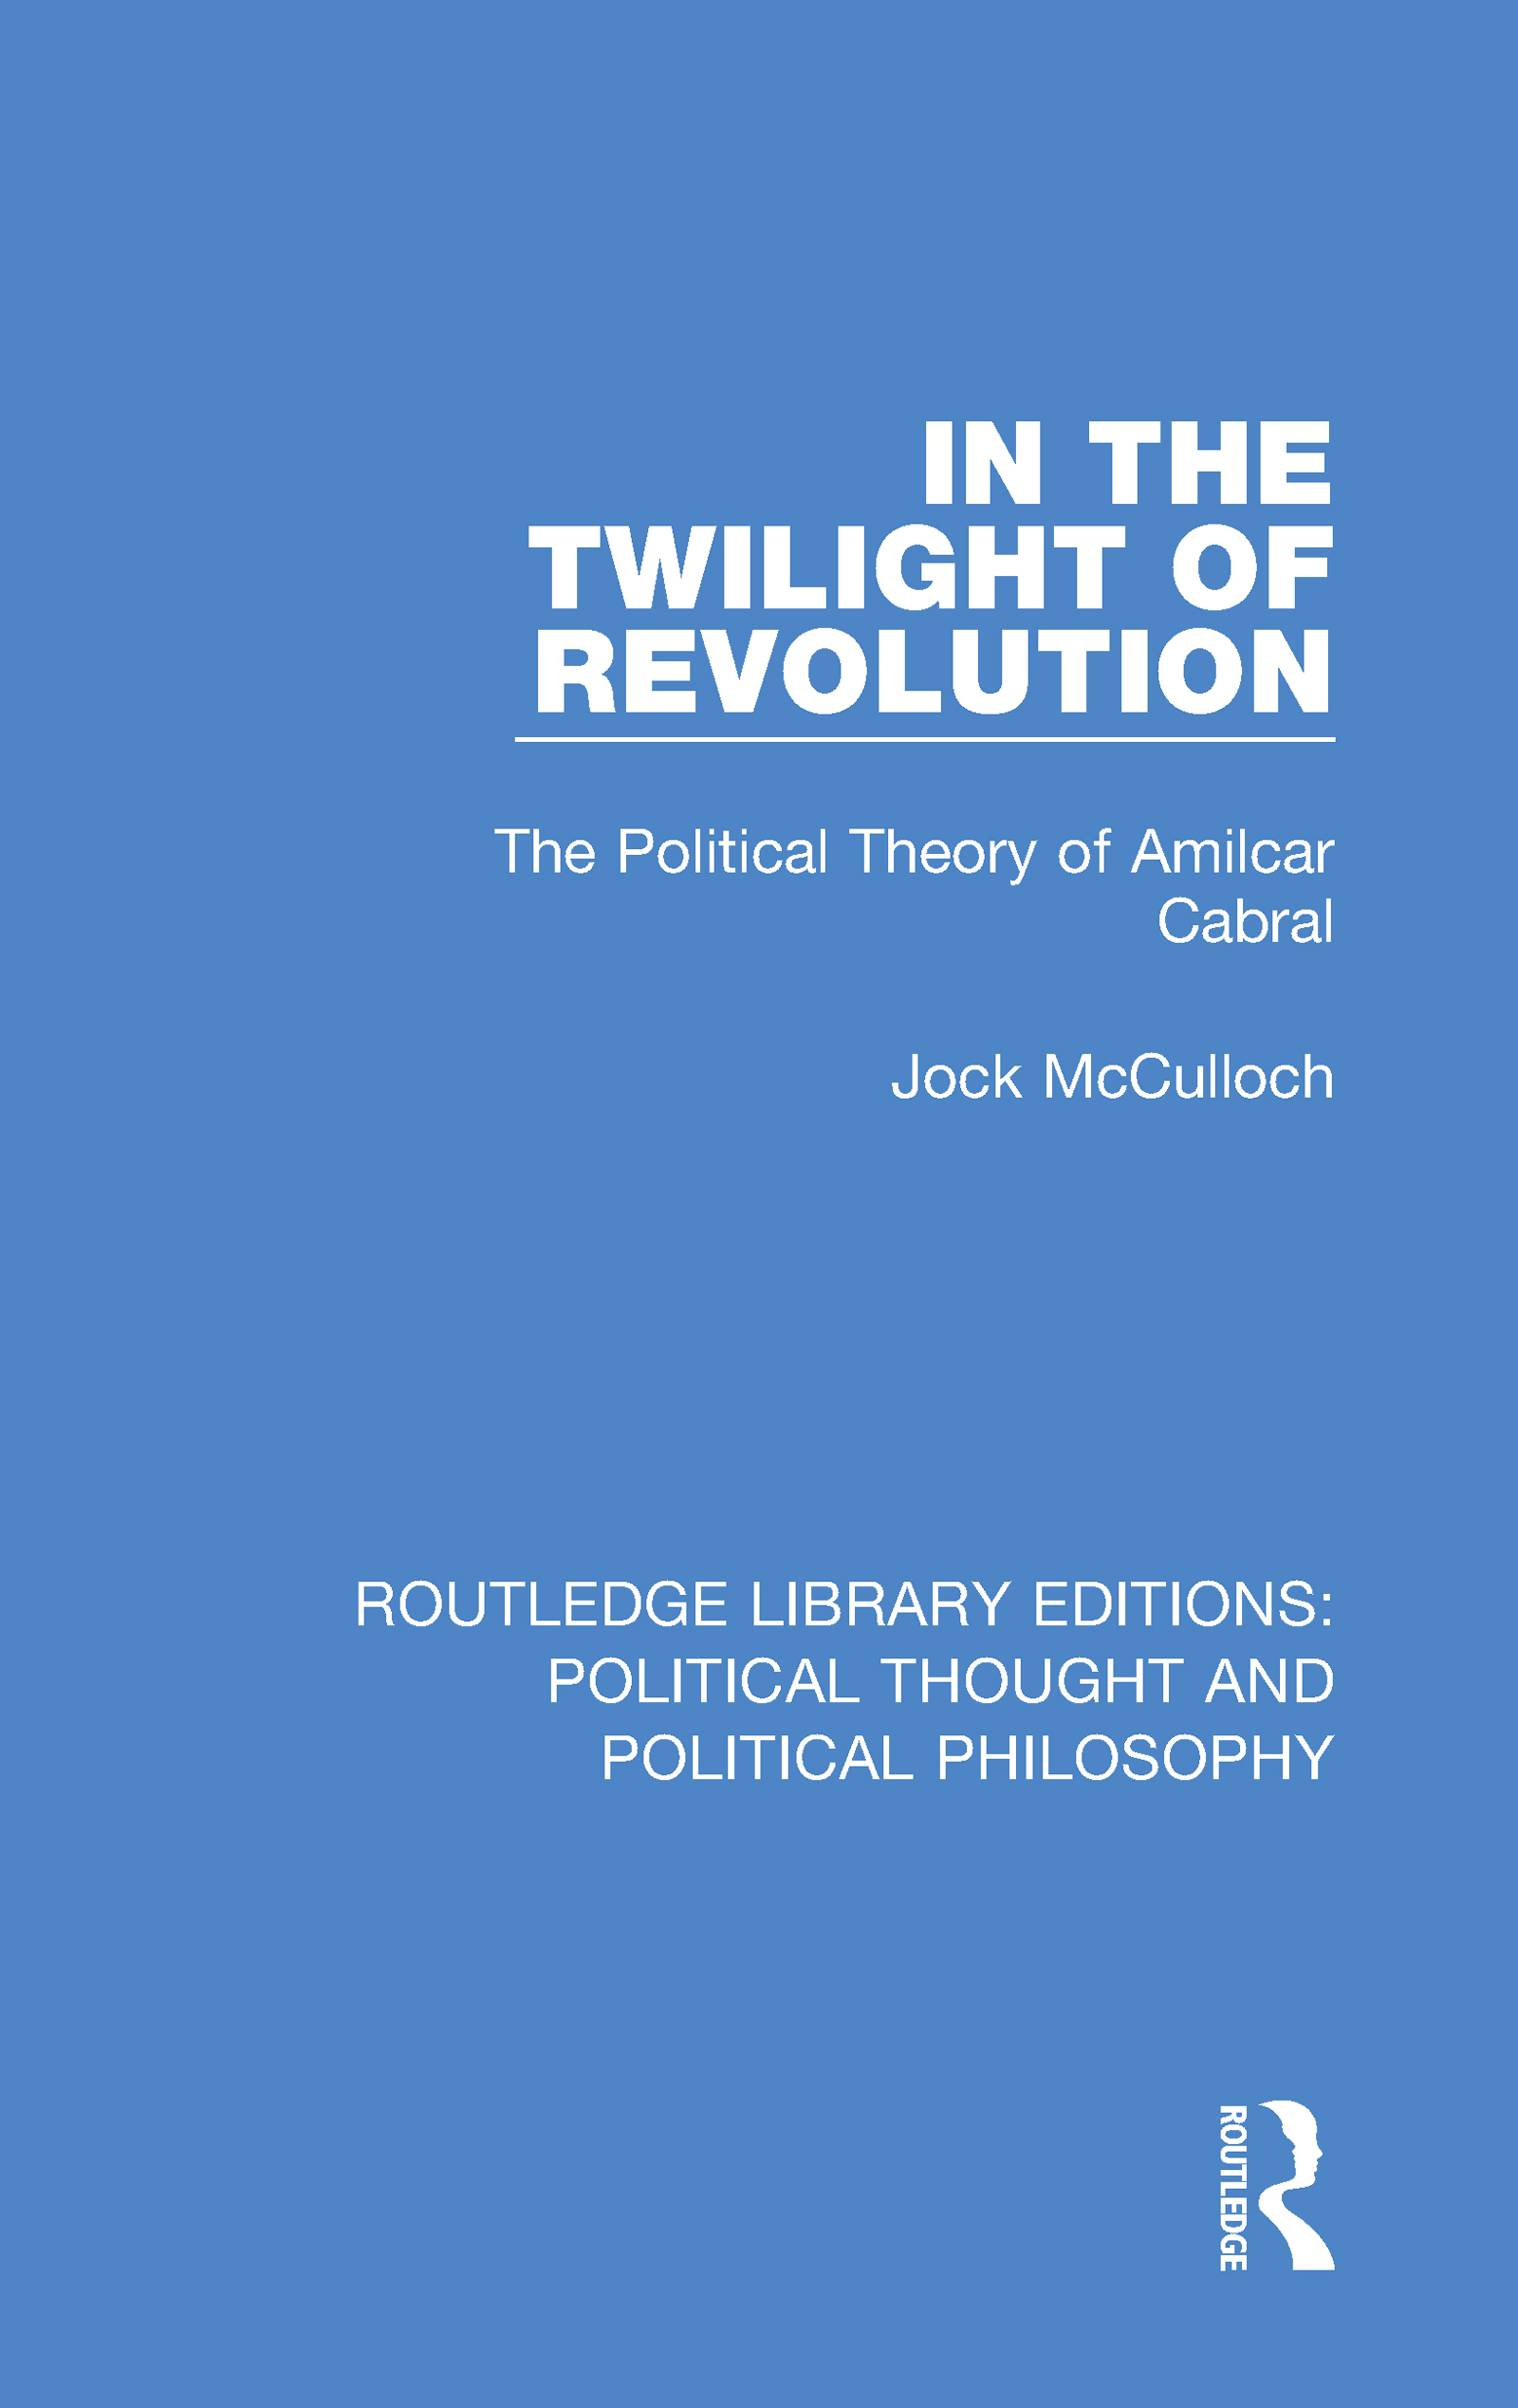 In the Twilight of Revolution